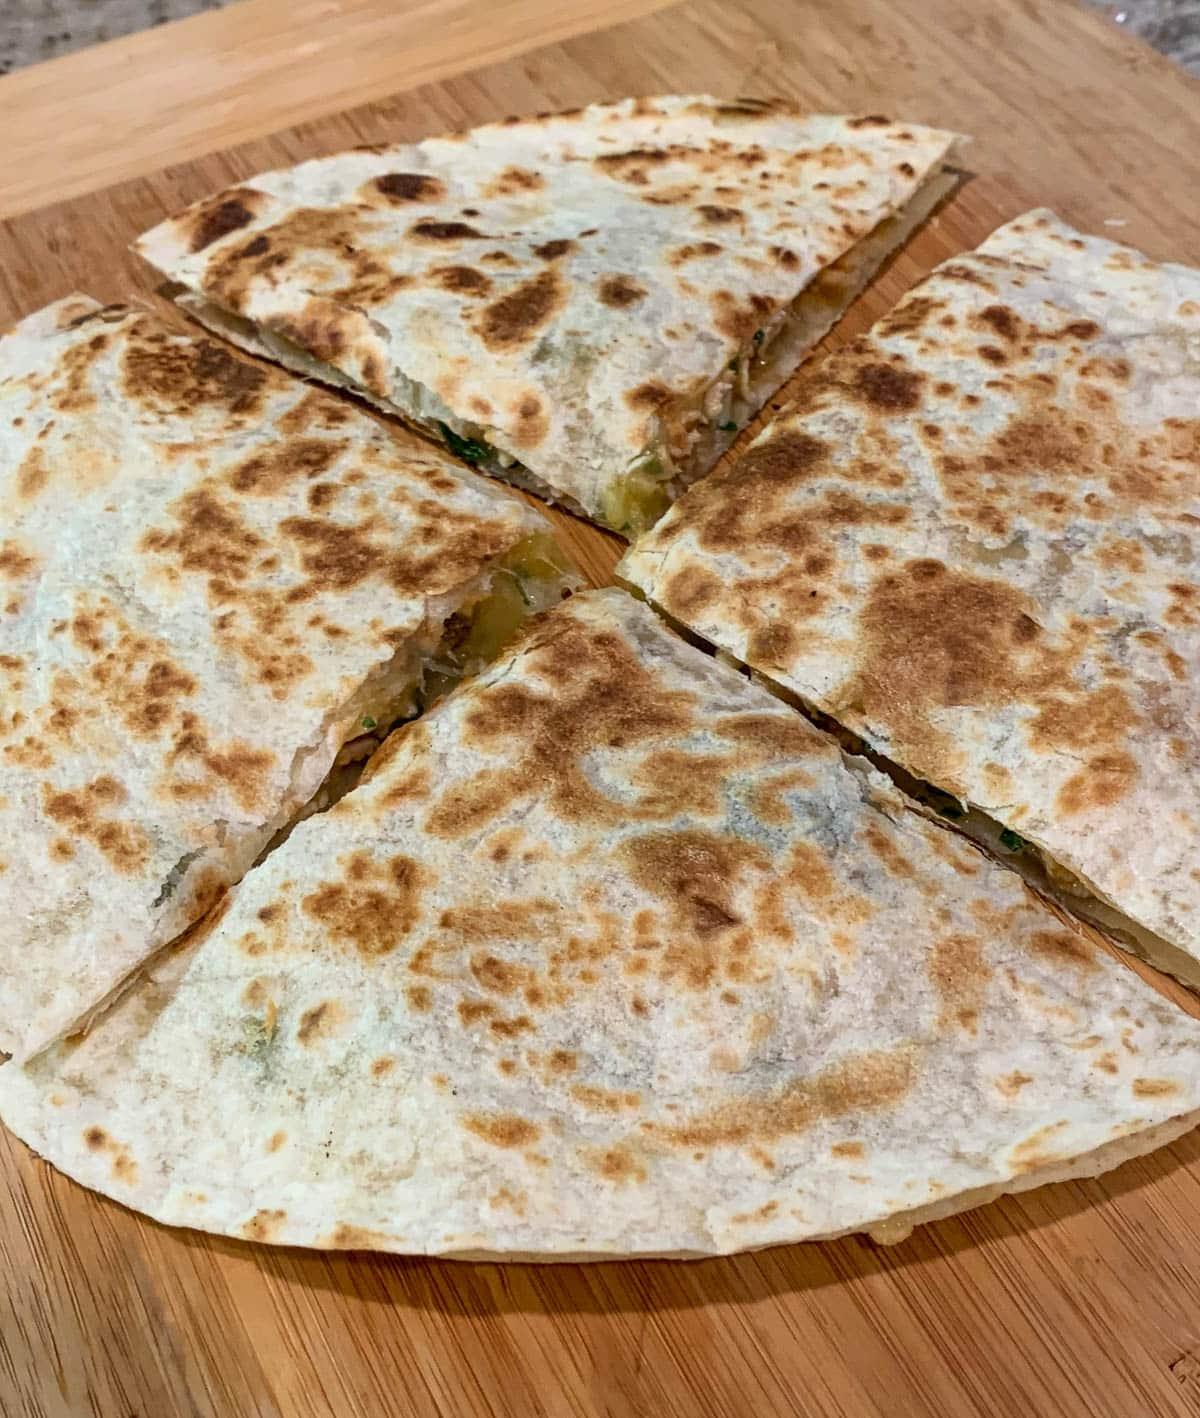 quartered quesadilla